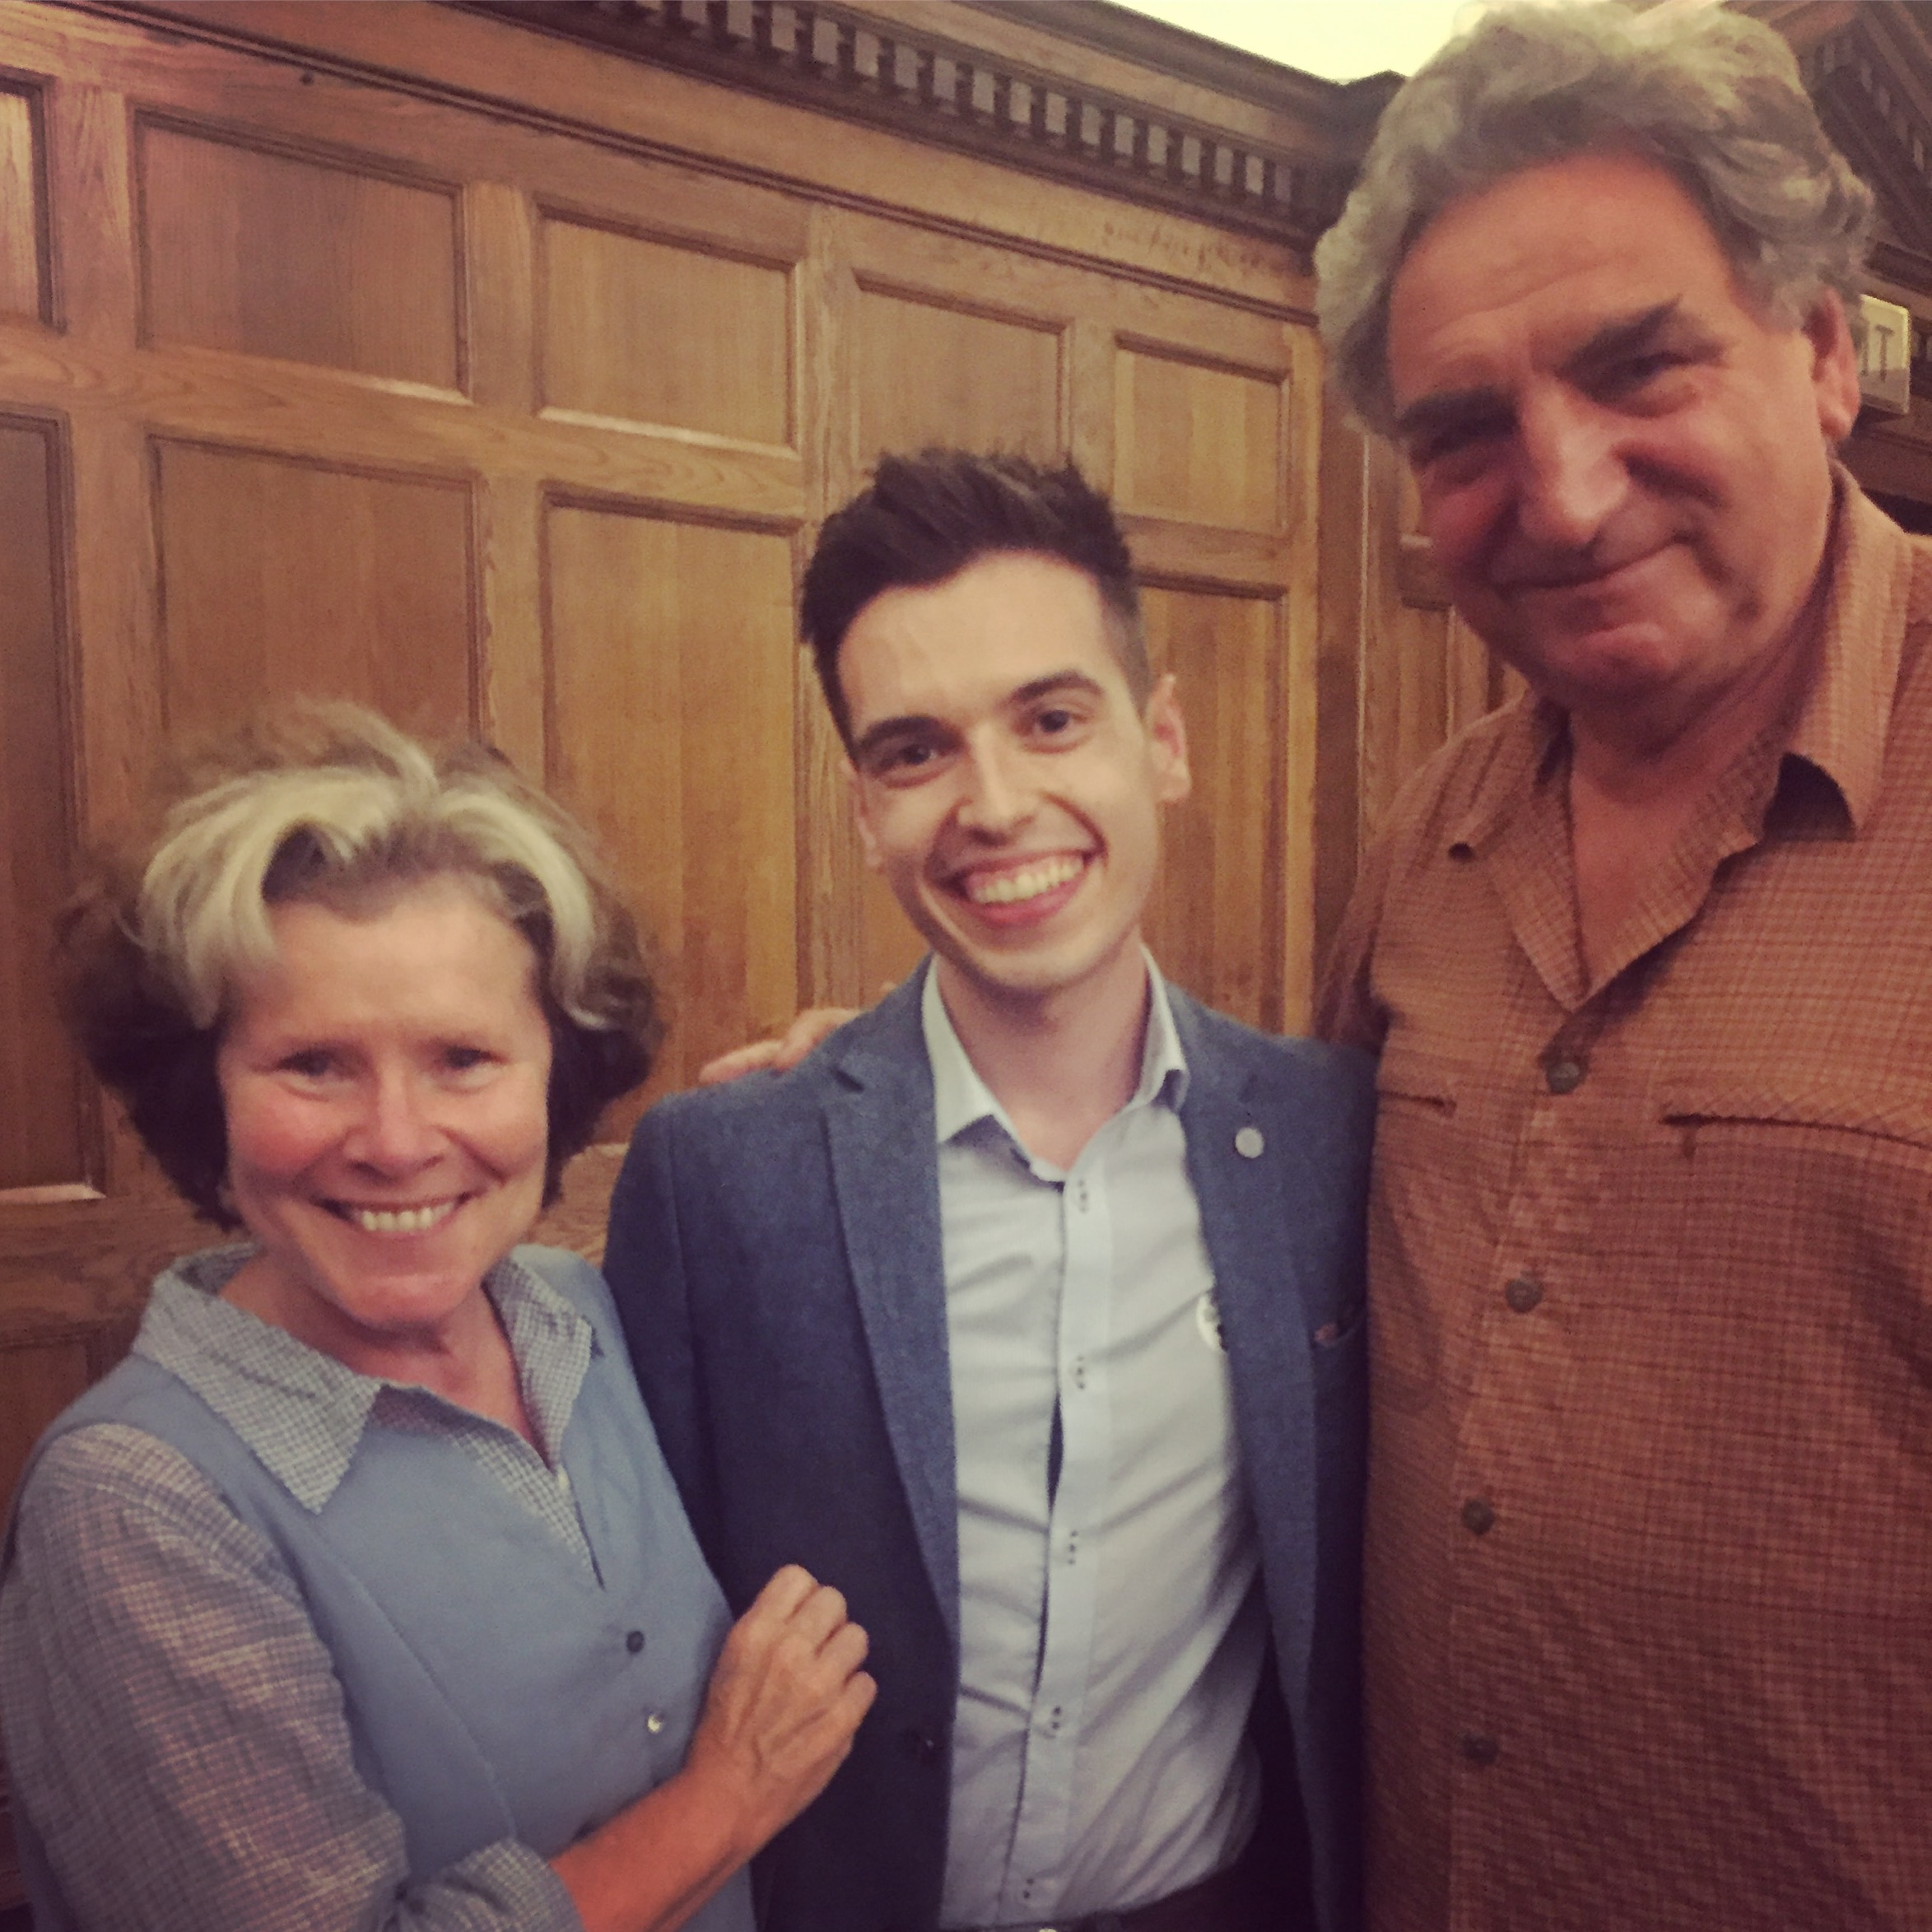 With Imelda Staunton & Jim Carter.